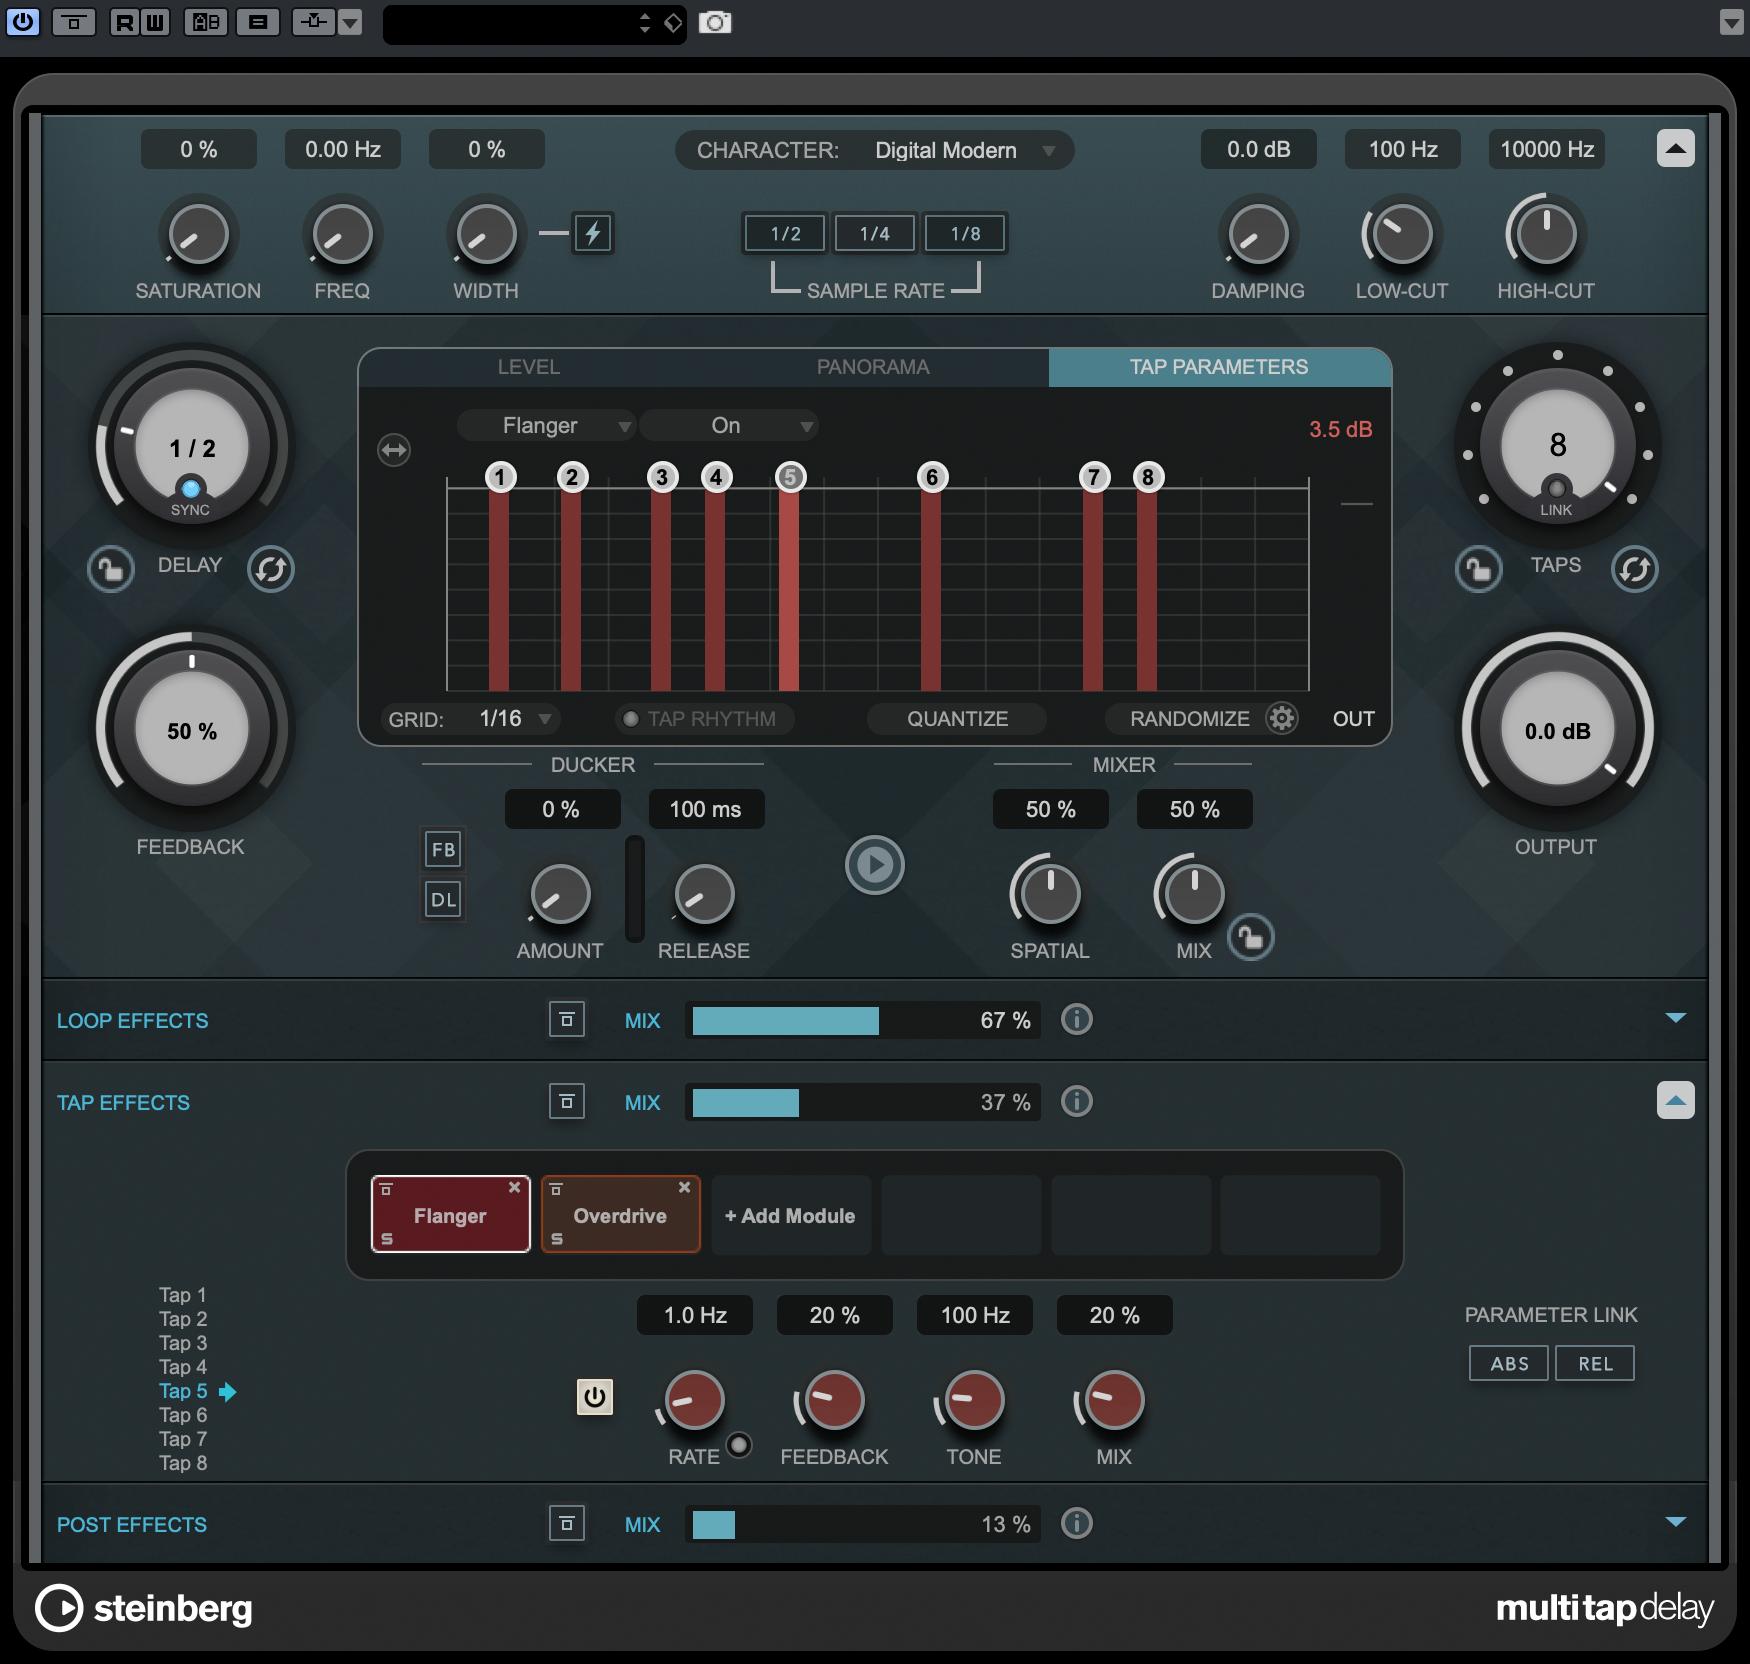 RYDDESALG | Steinberg Cubase Pro 10.5 Competative Crossgrade